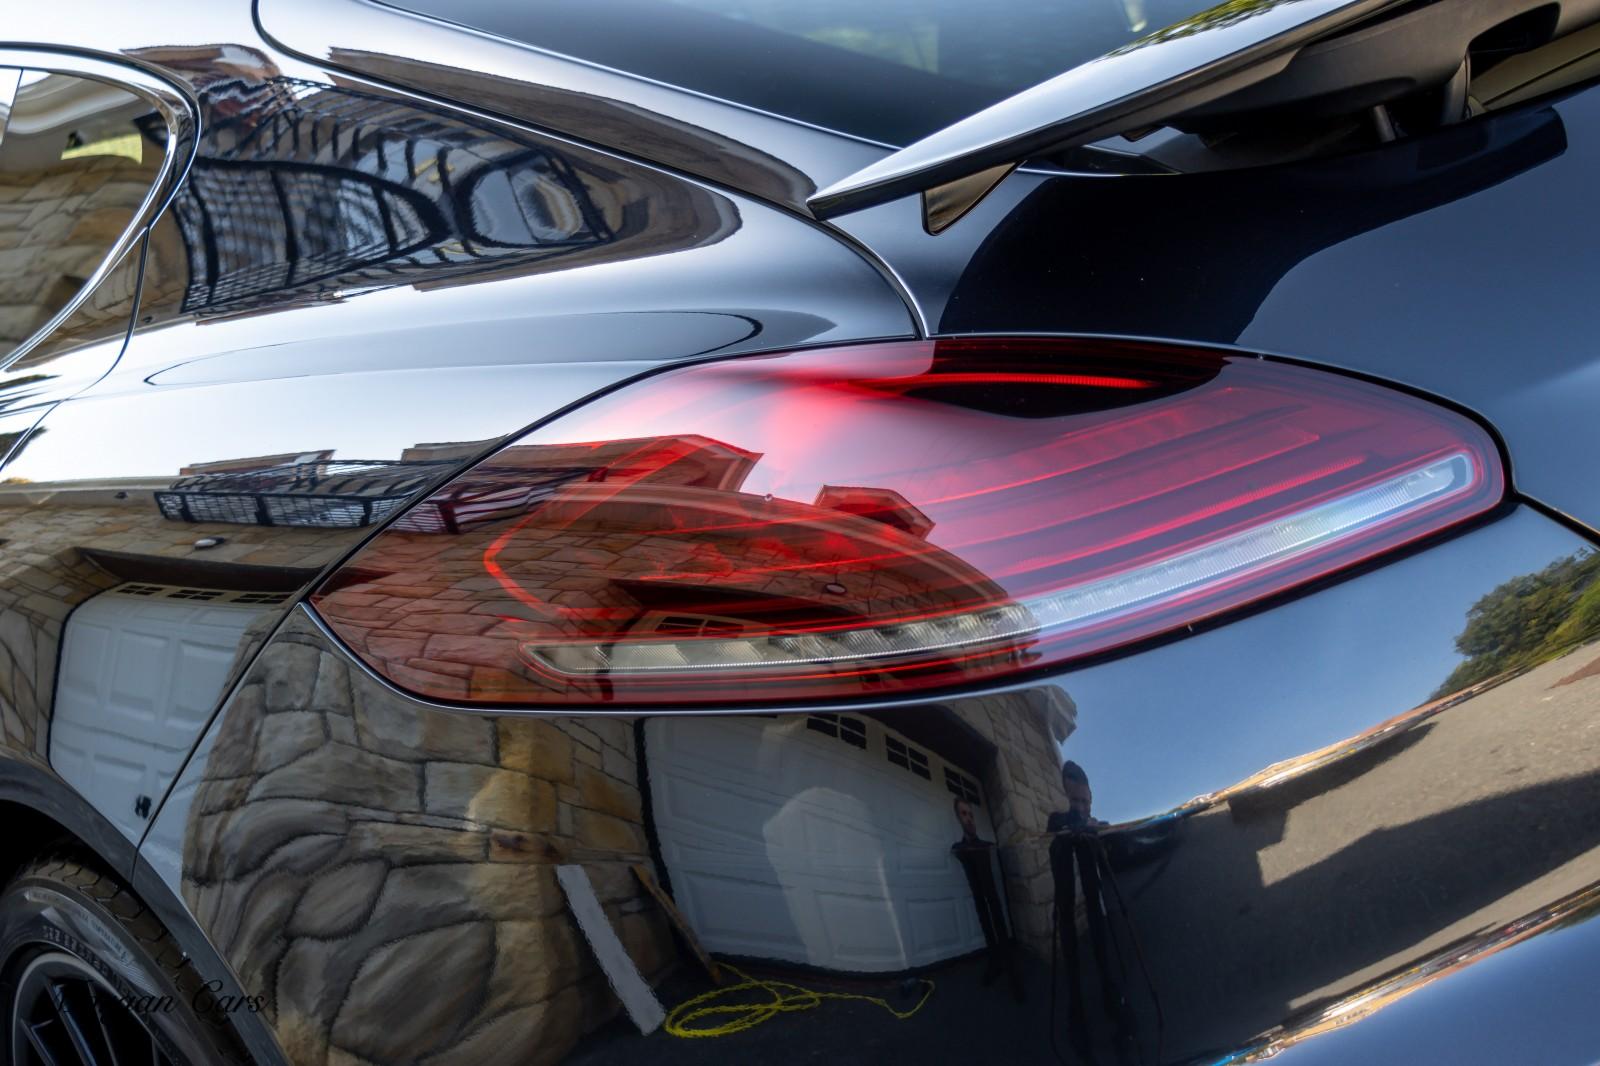 2014 Porsche Panamera V8 TURBO S 4S PDK Petrol Semi Auto – Morgan Cars 9 Mound Road, Warrenpoint, Newry BT34 3LW, UK full